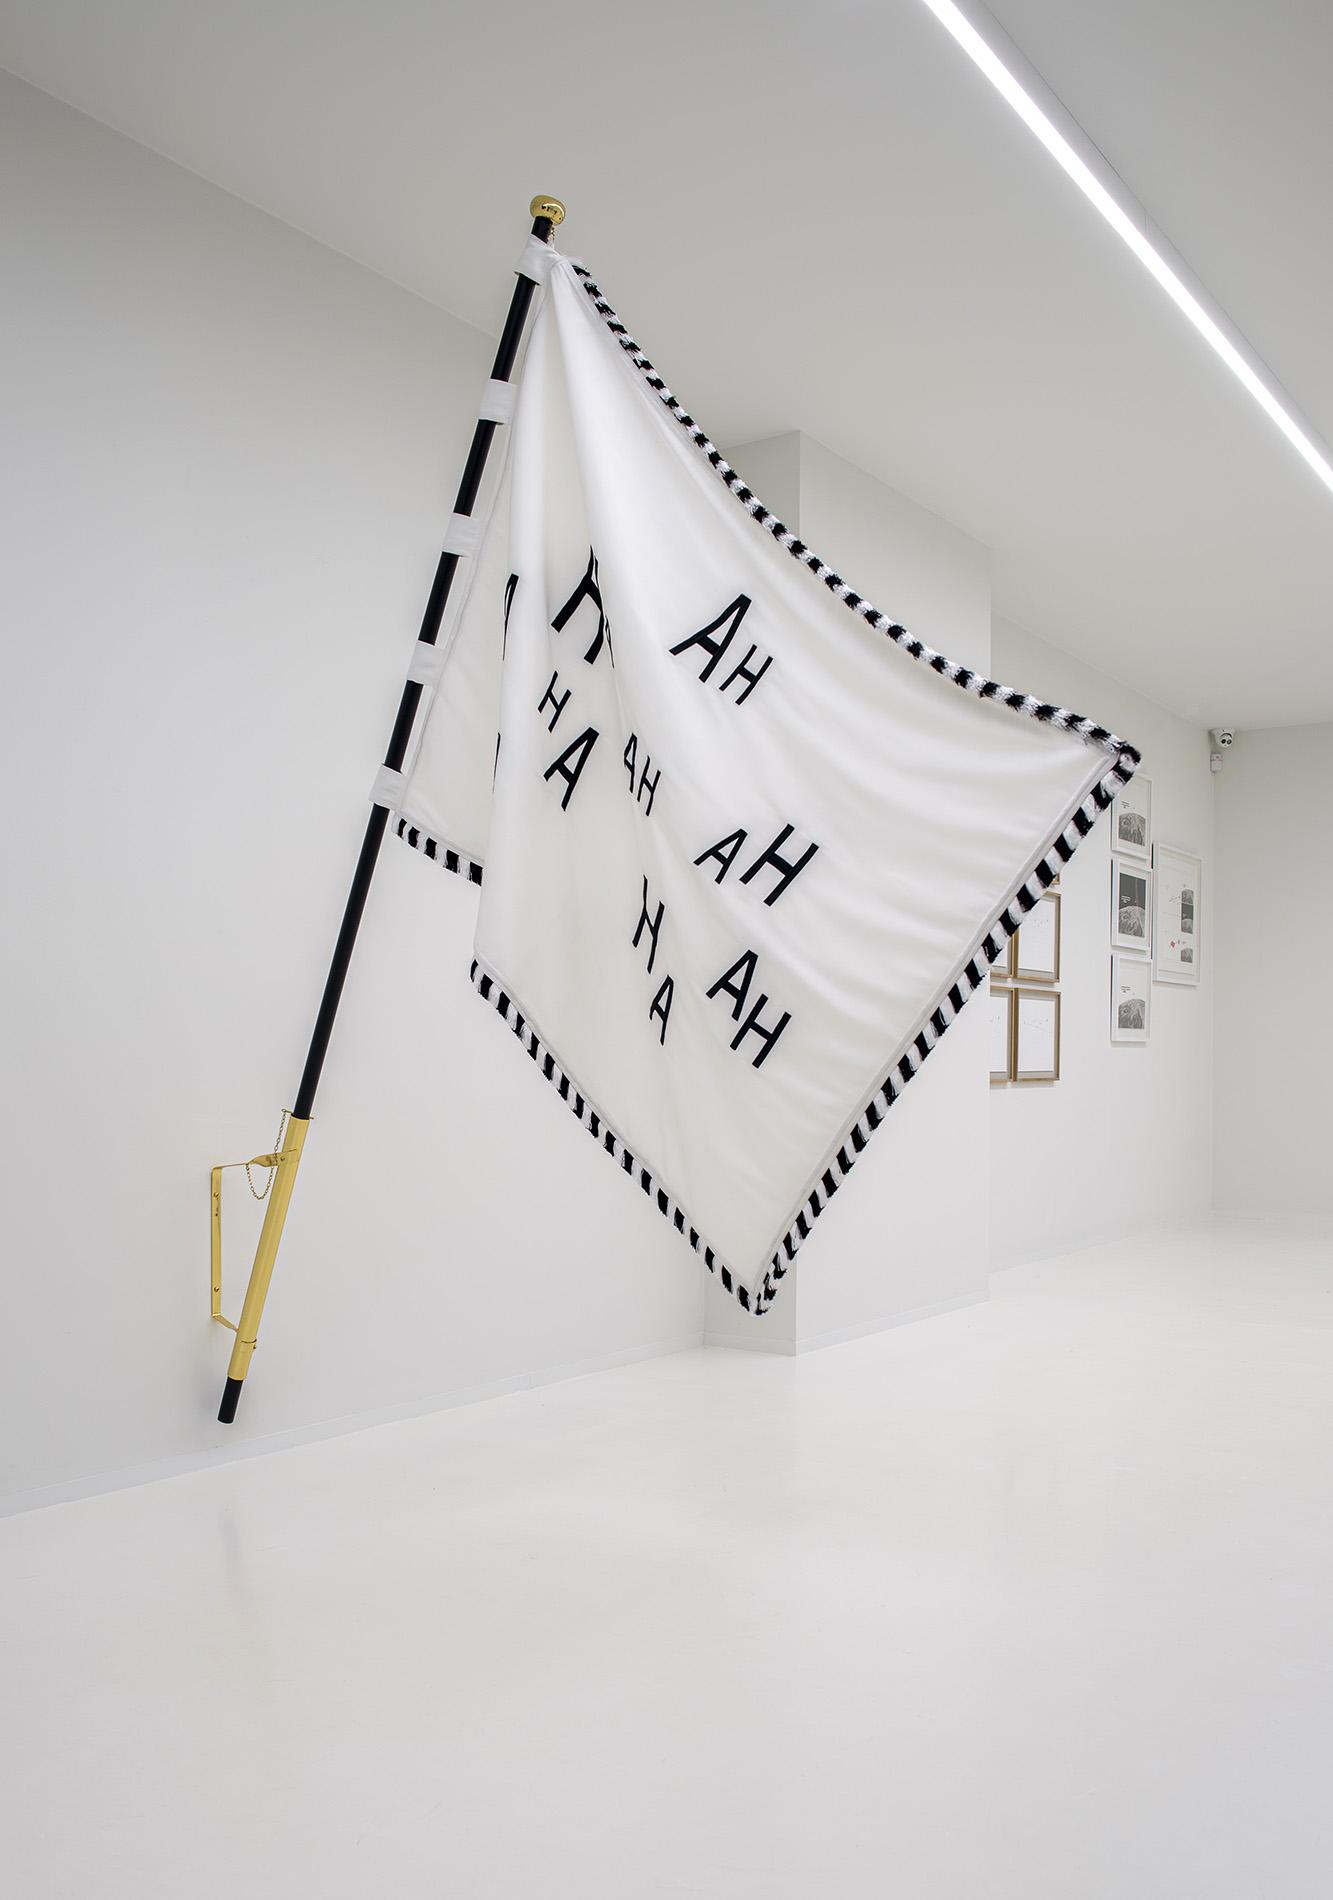 Eric Colpaert | 'AHA' Vlag / Drapeau 'AHA' 2019